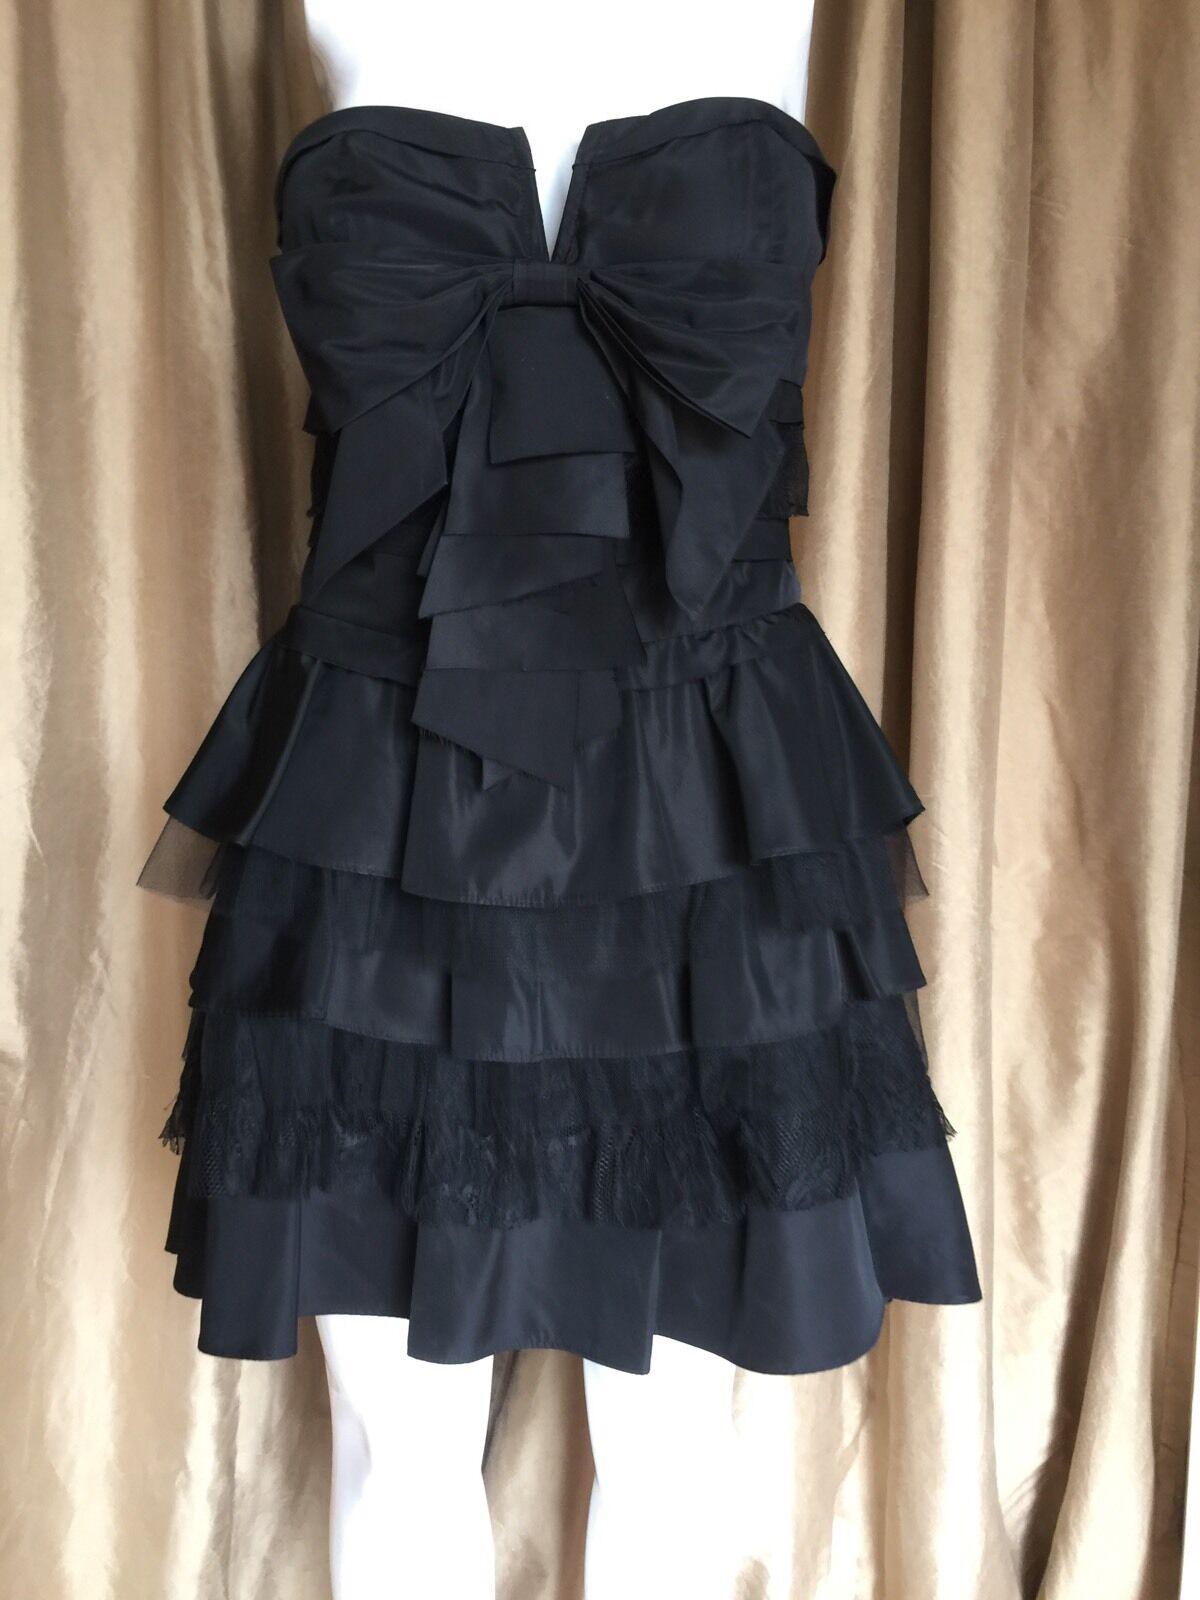 BEBE schwarz Bustier Ruffle Strapless Mini Dress Größe M